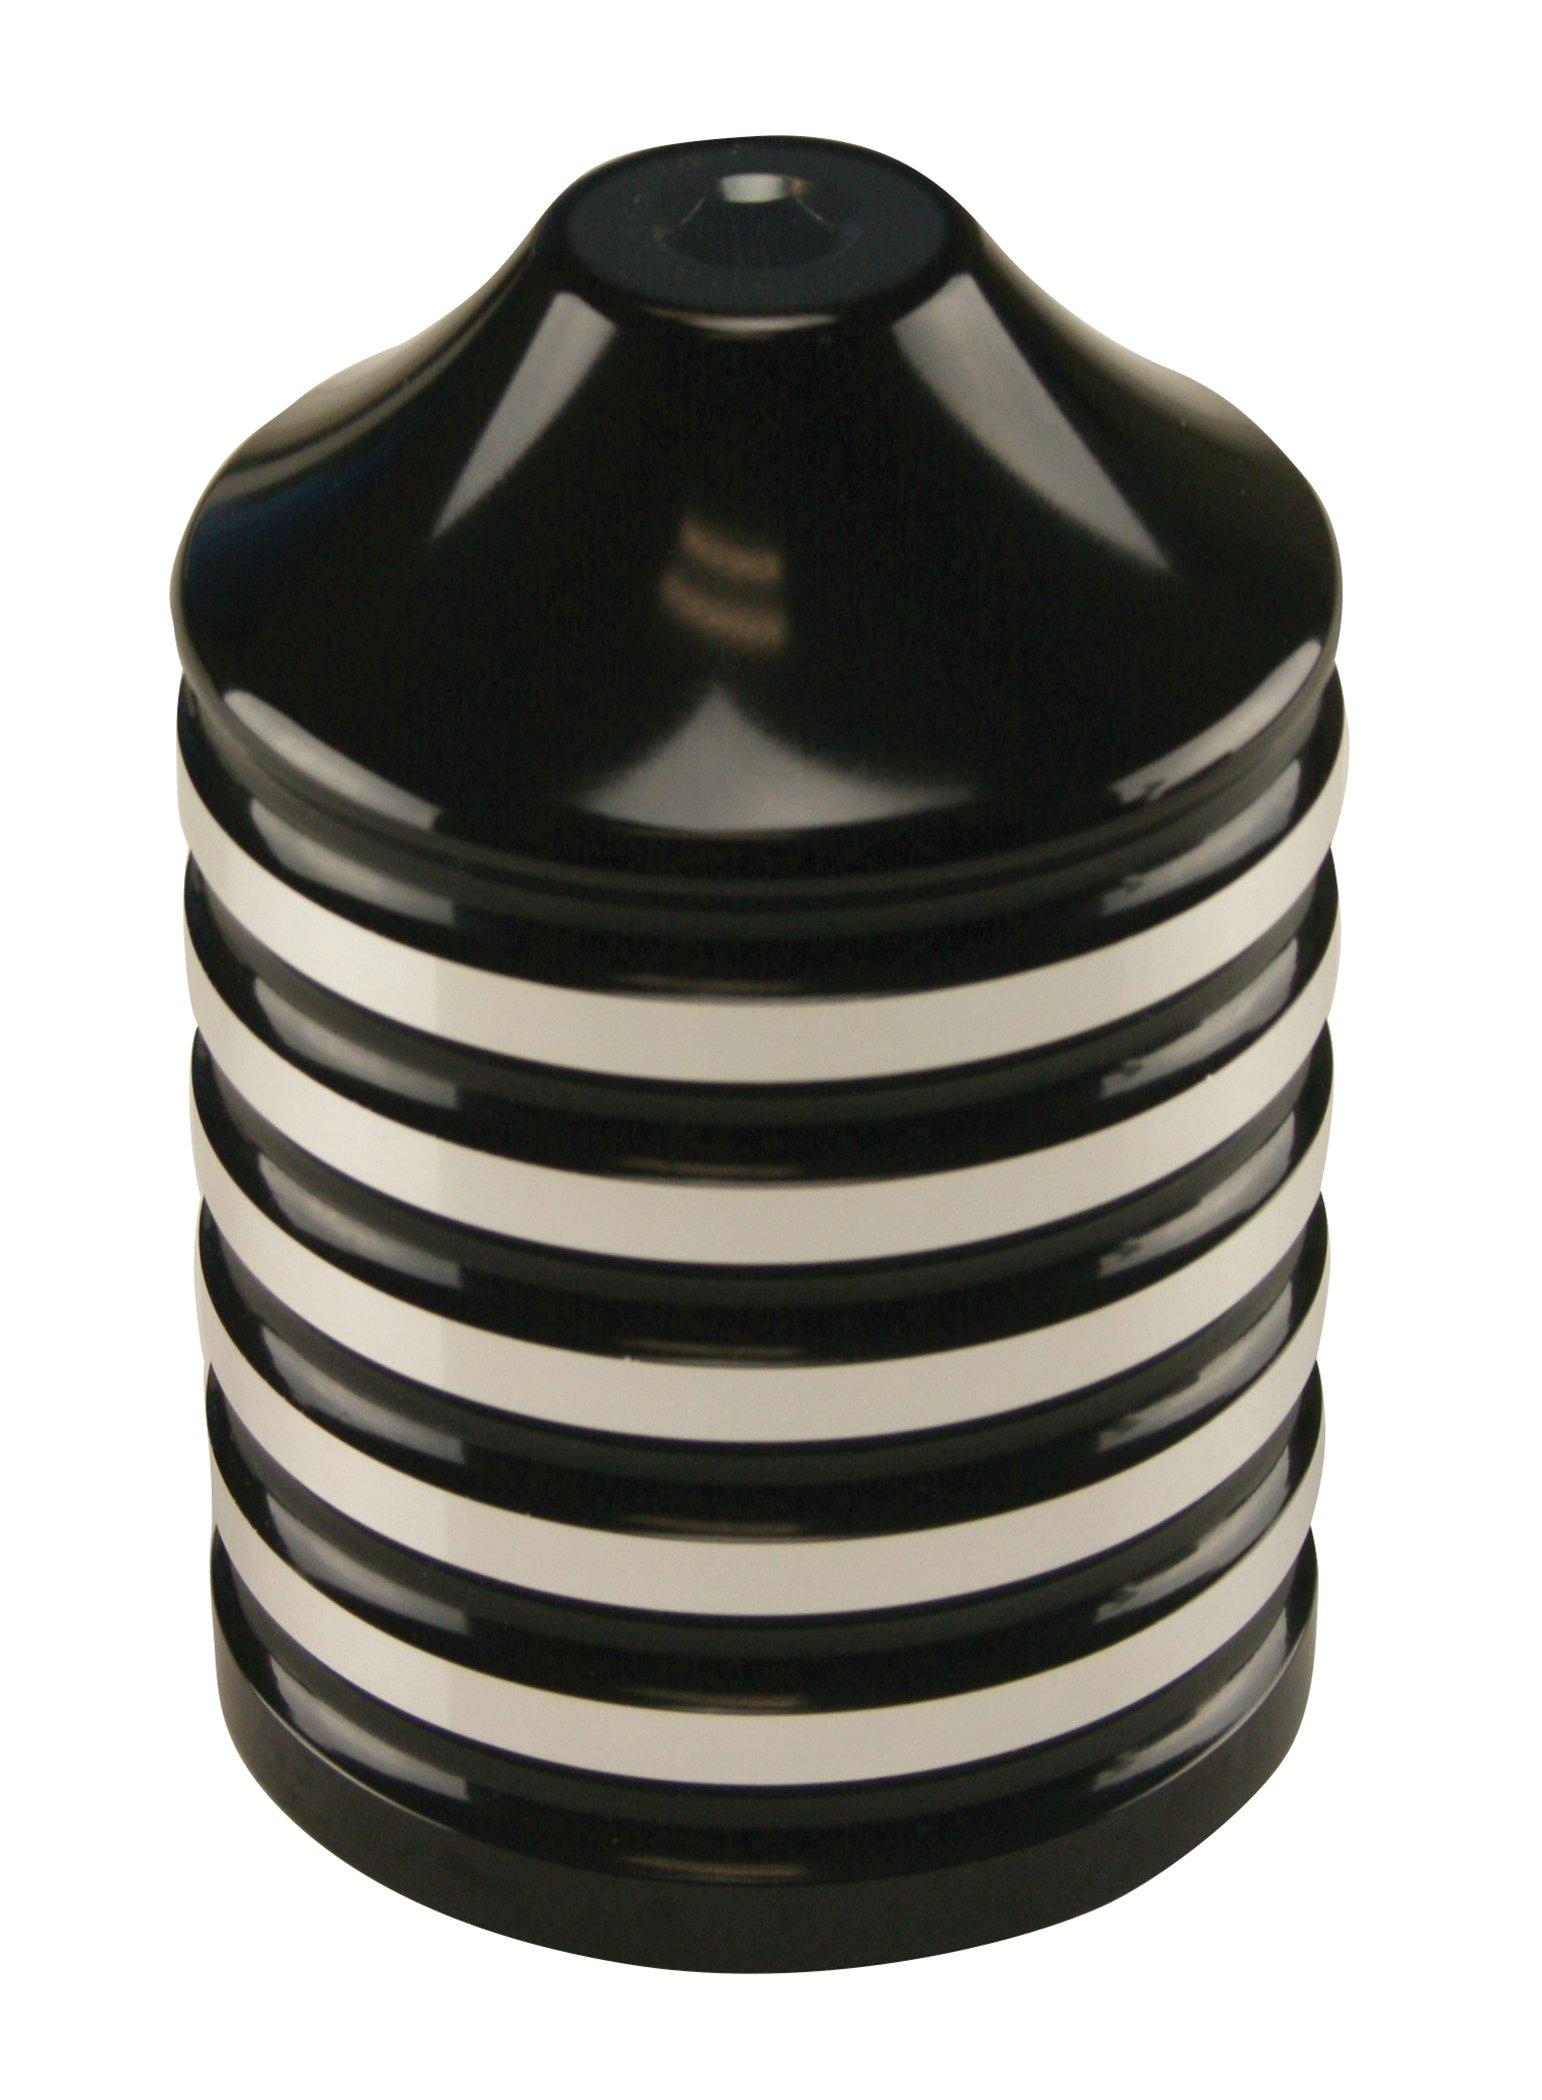 Ultima Billet Black Re-Usable Lifetime Oil Filter, 25-80 by Ultima